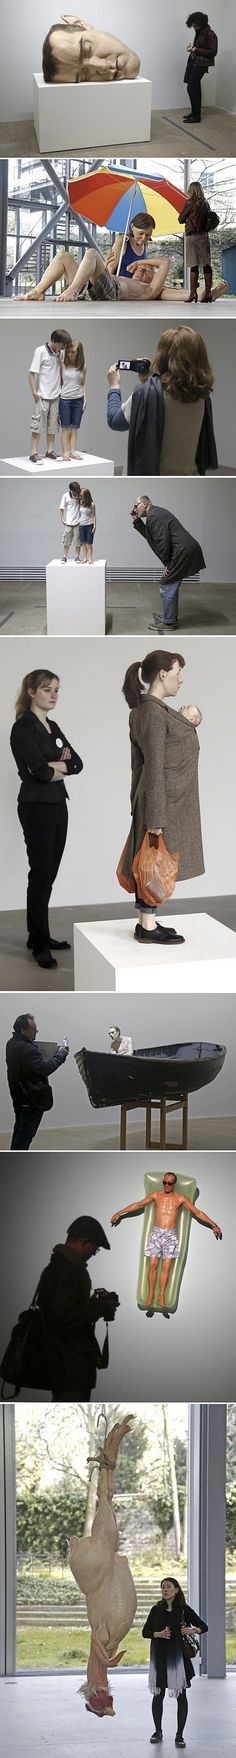 ron mueck sculptures | Ron Mueck : Hyper-Realistic Sculptures | Art